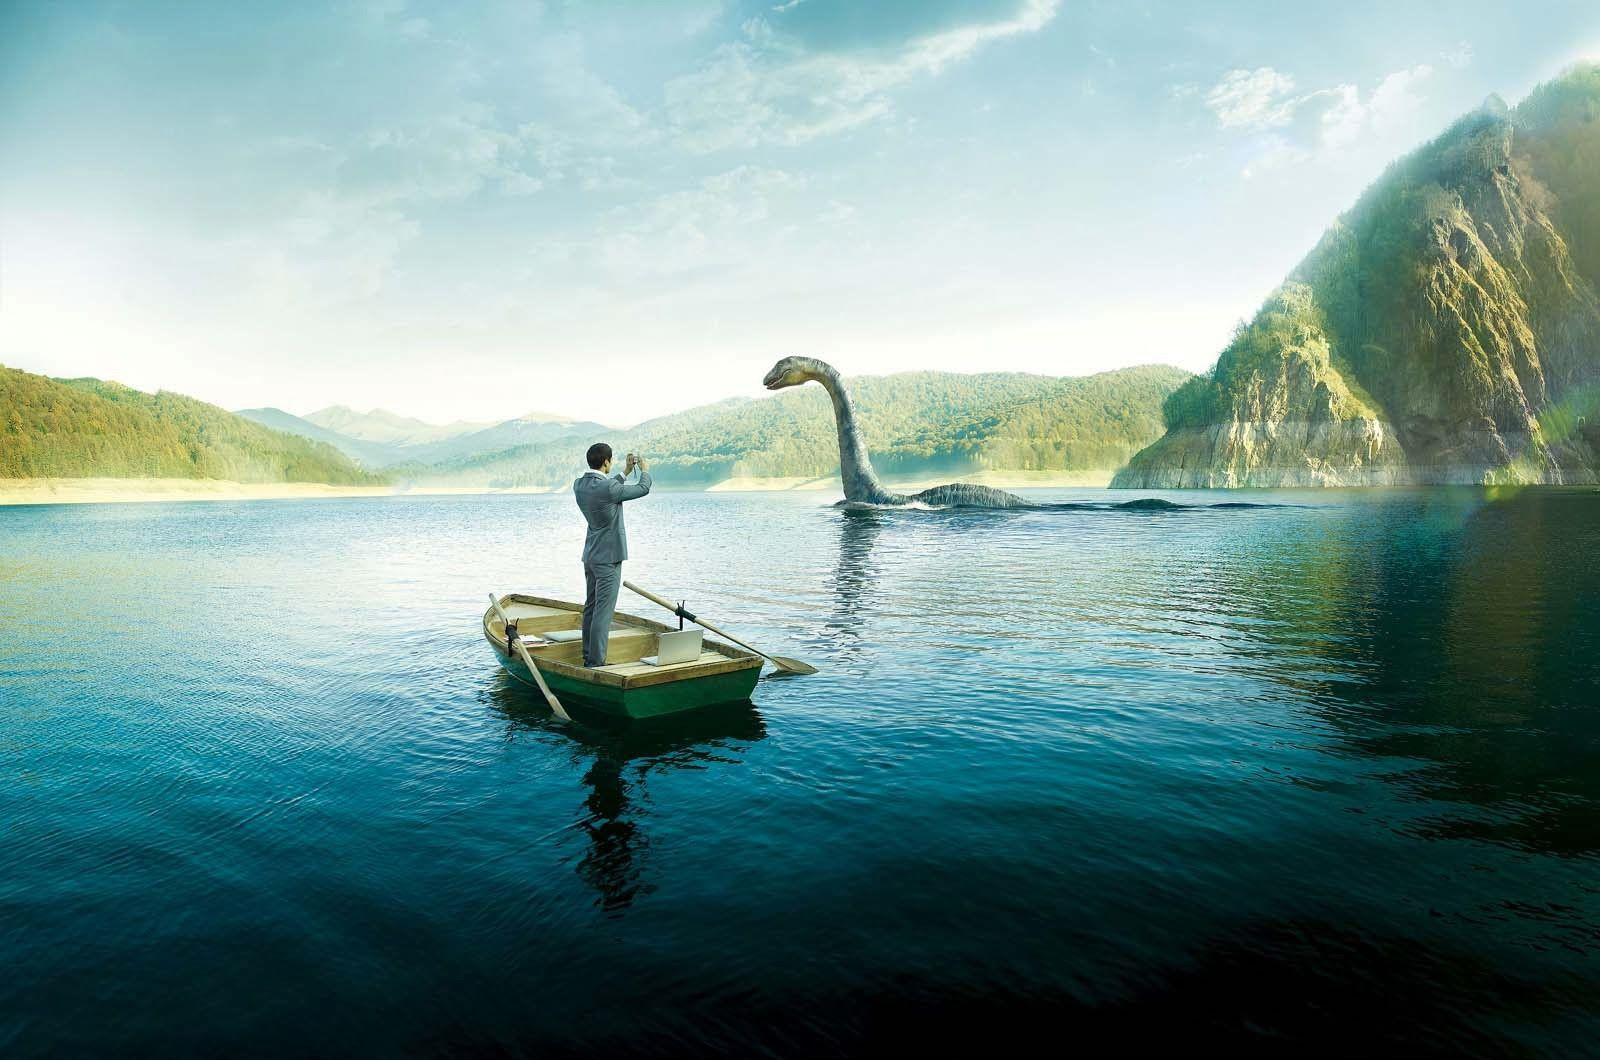 Loch Ness Monster Loch Ness Monster Movie Legendary Monsters